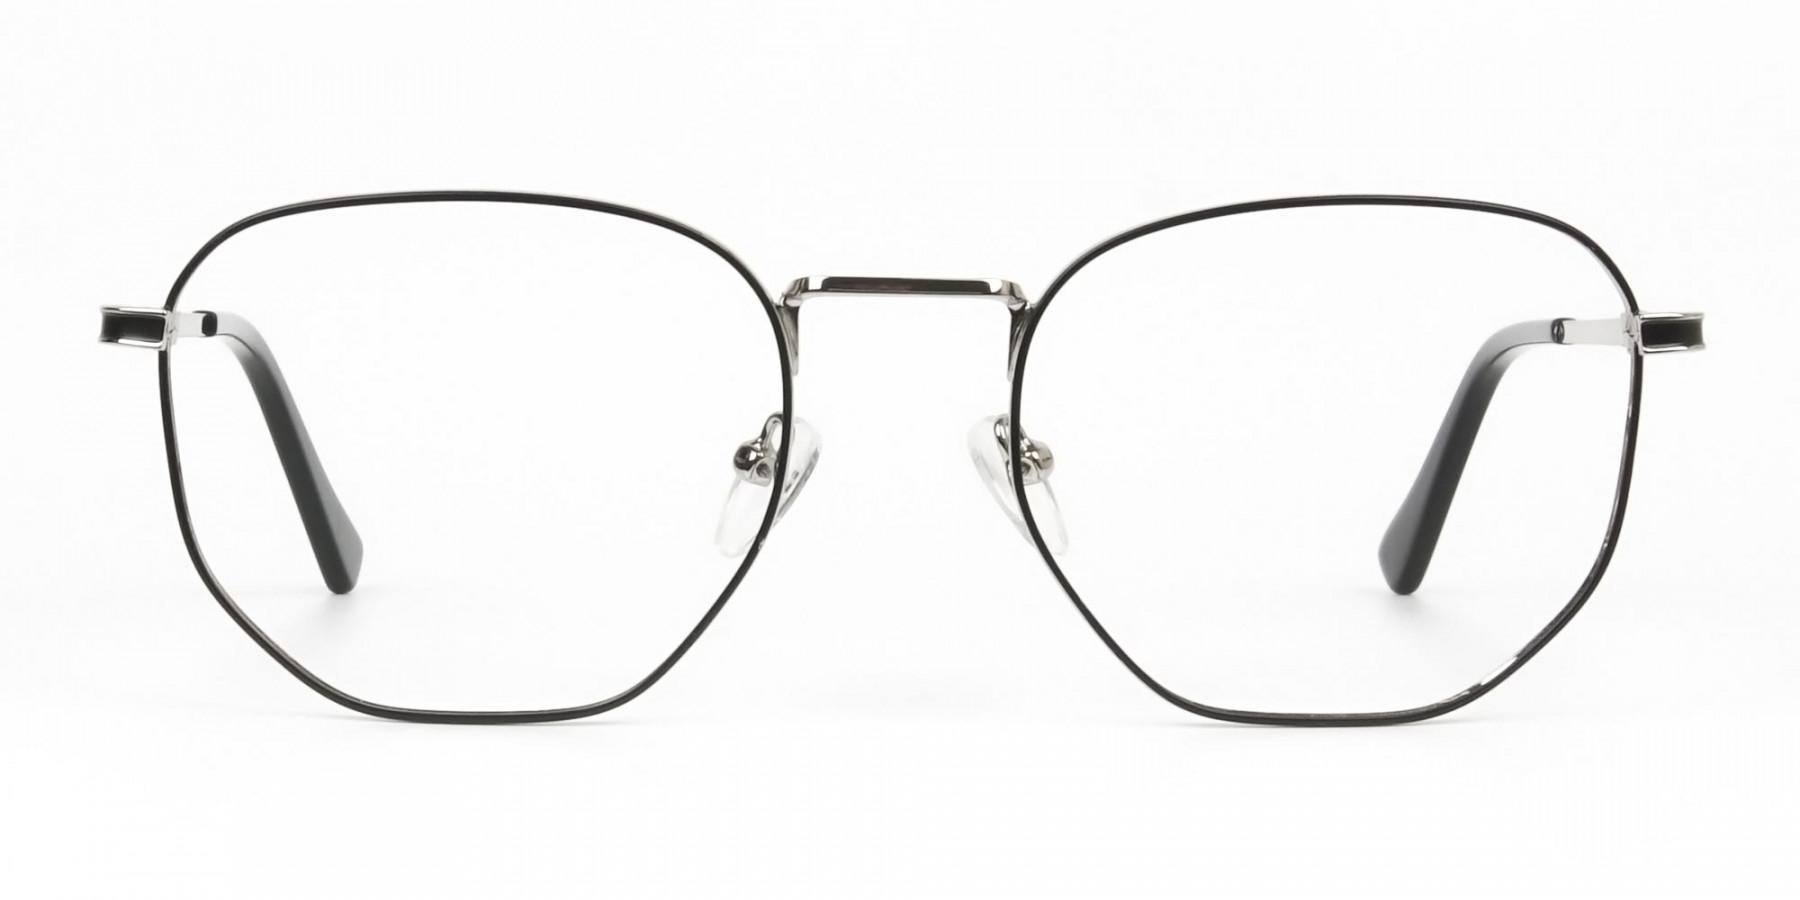 Lightweight Black & Silver Geometric Glasses - 1